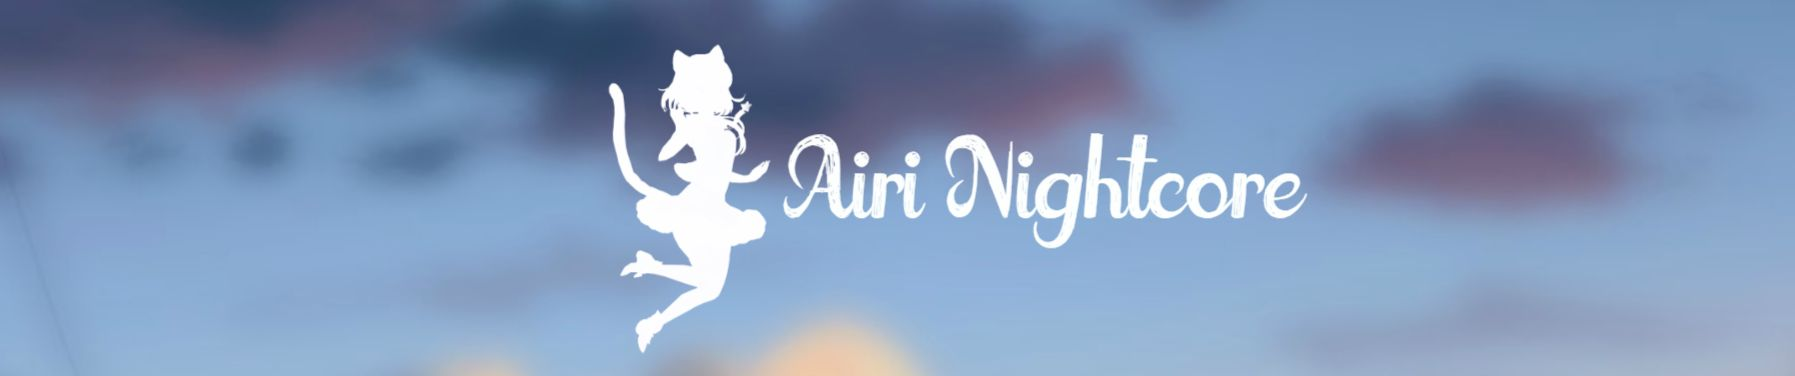 Nightcore - Helplessly by Airi Nightcore ♥ | Free Listening